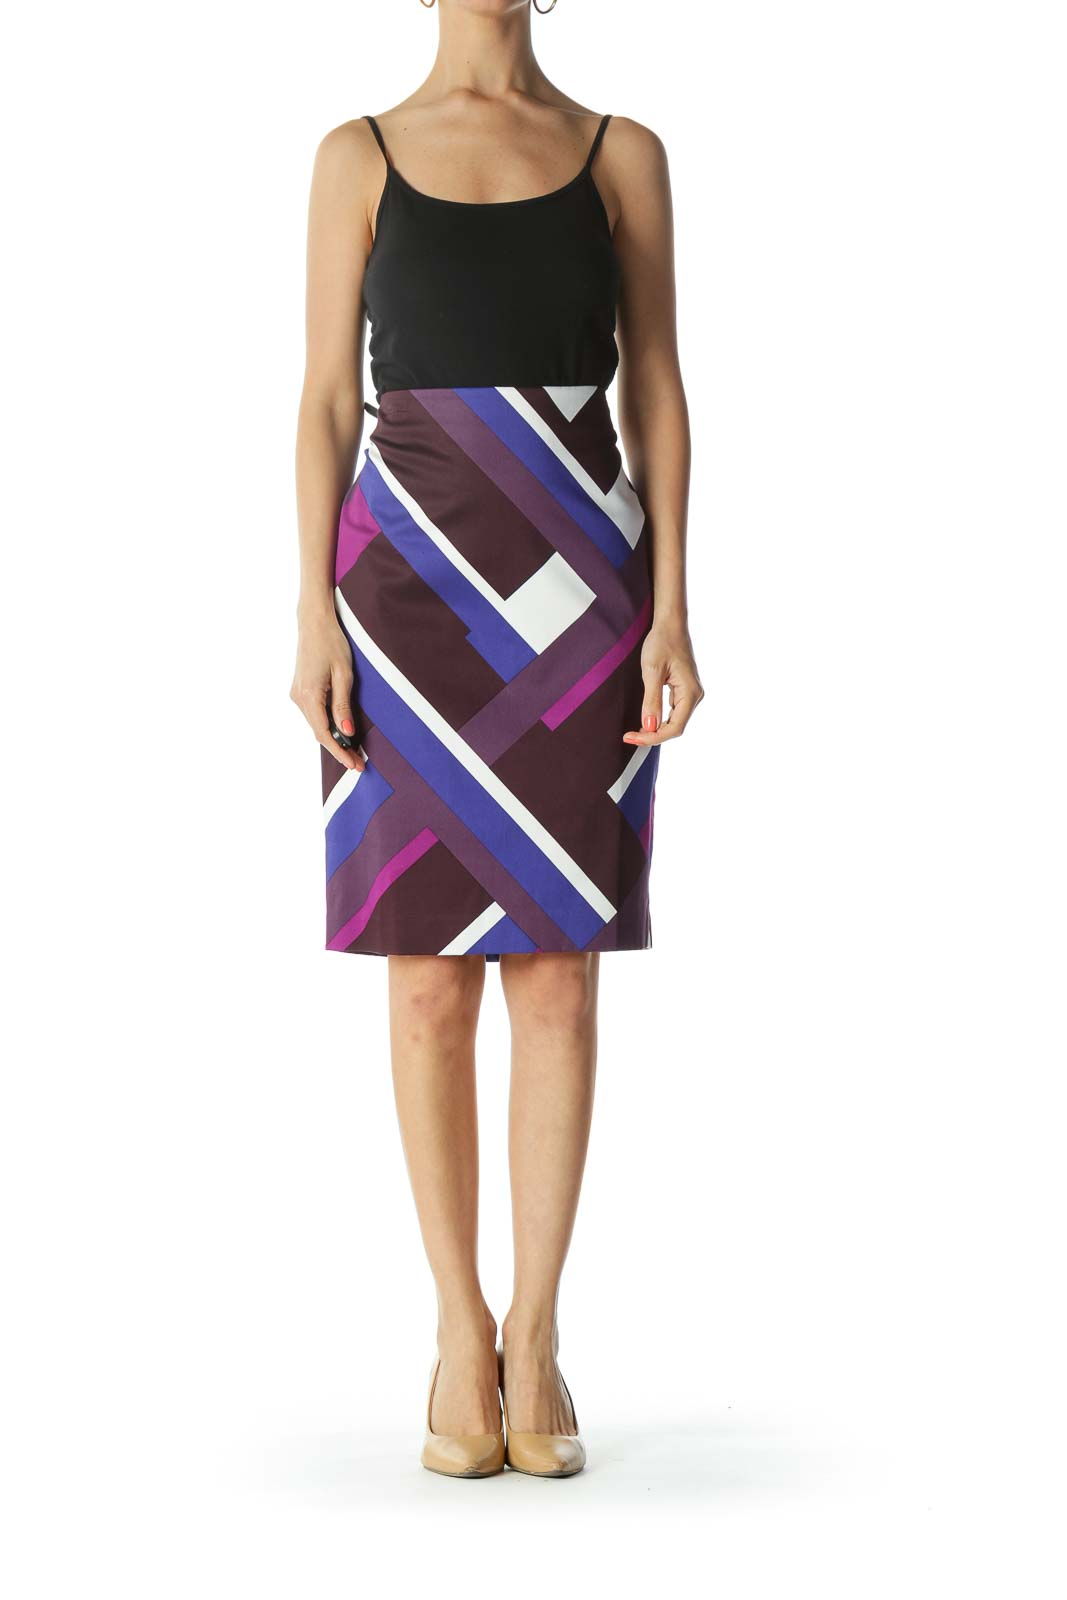 Purple, Blue, and White Geometric Print Skirt